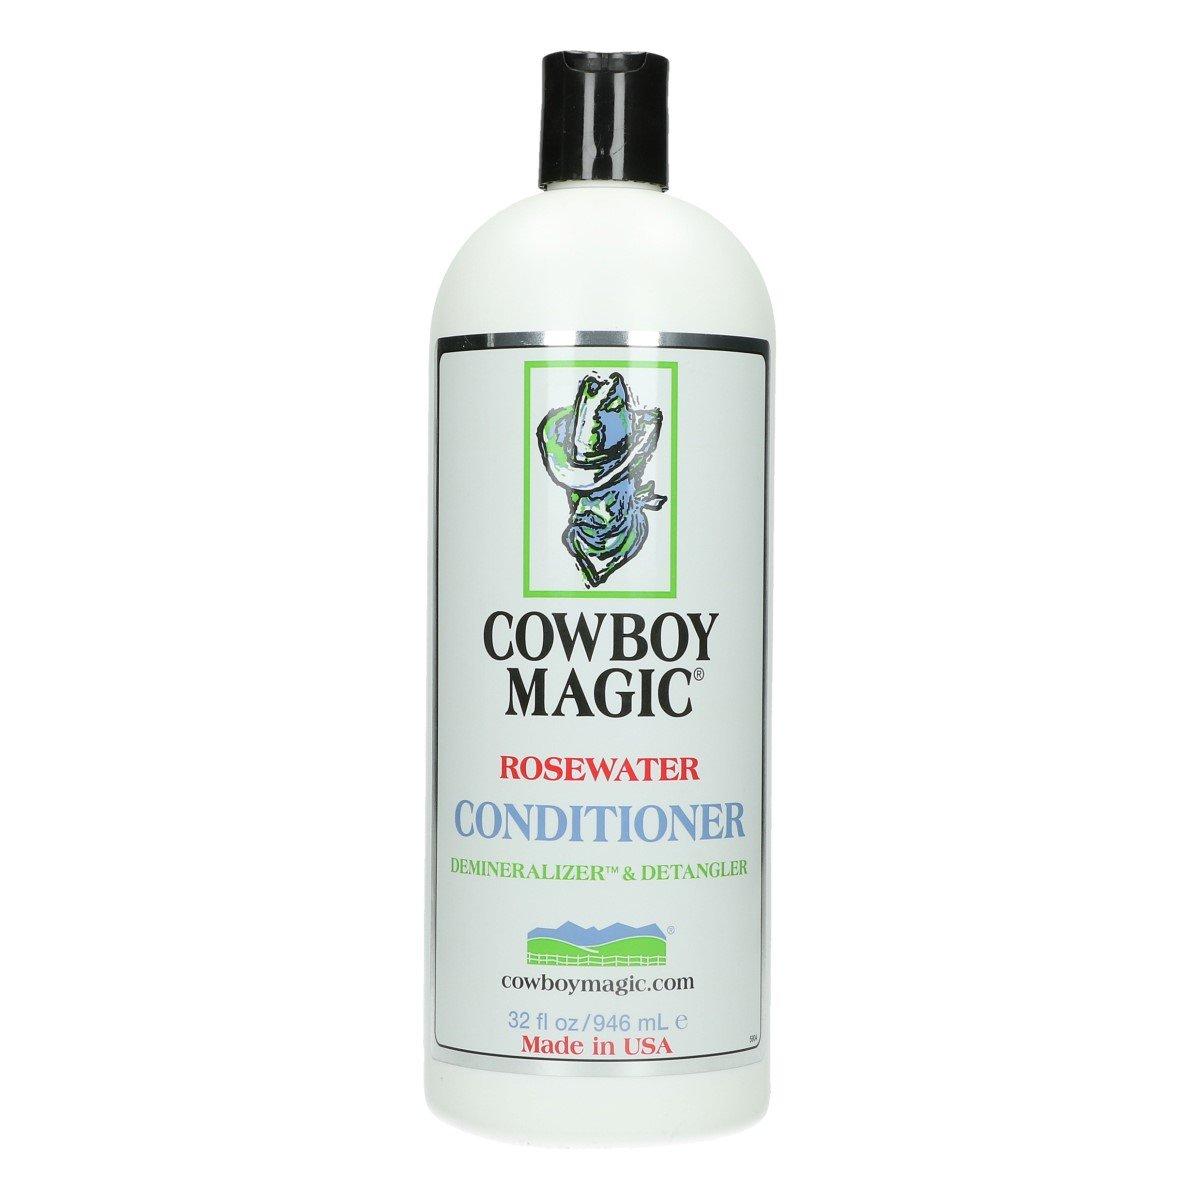 Afbeelding van Cowboy Magic Rosewater Conditioner 946ml